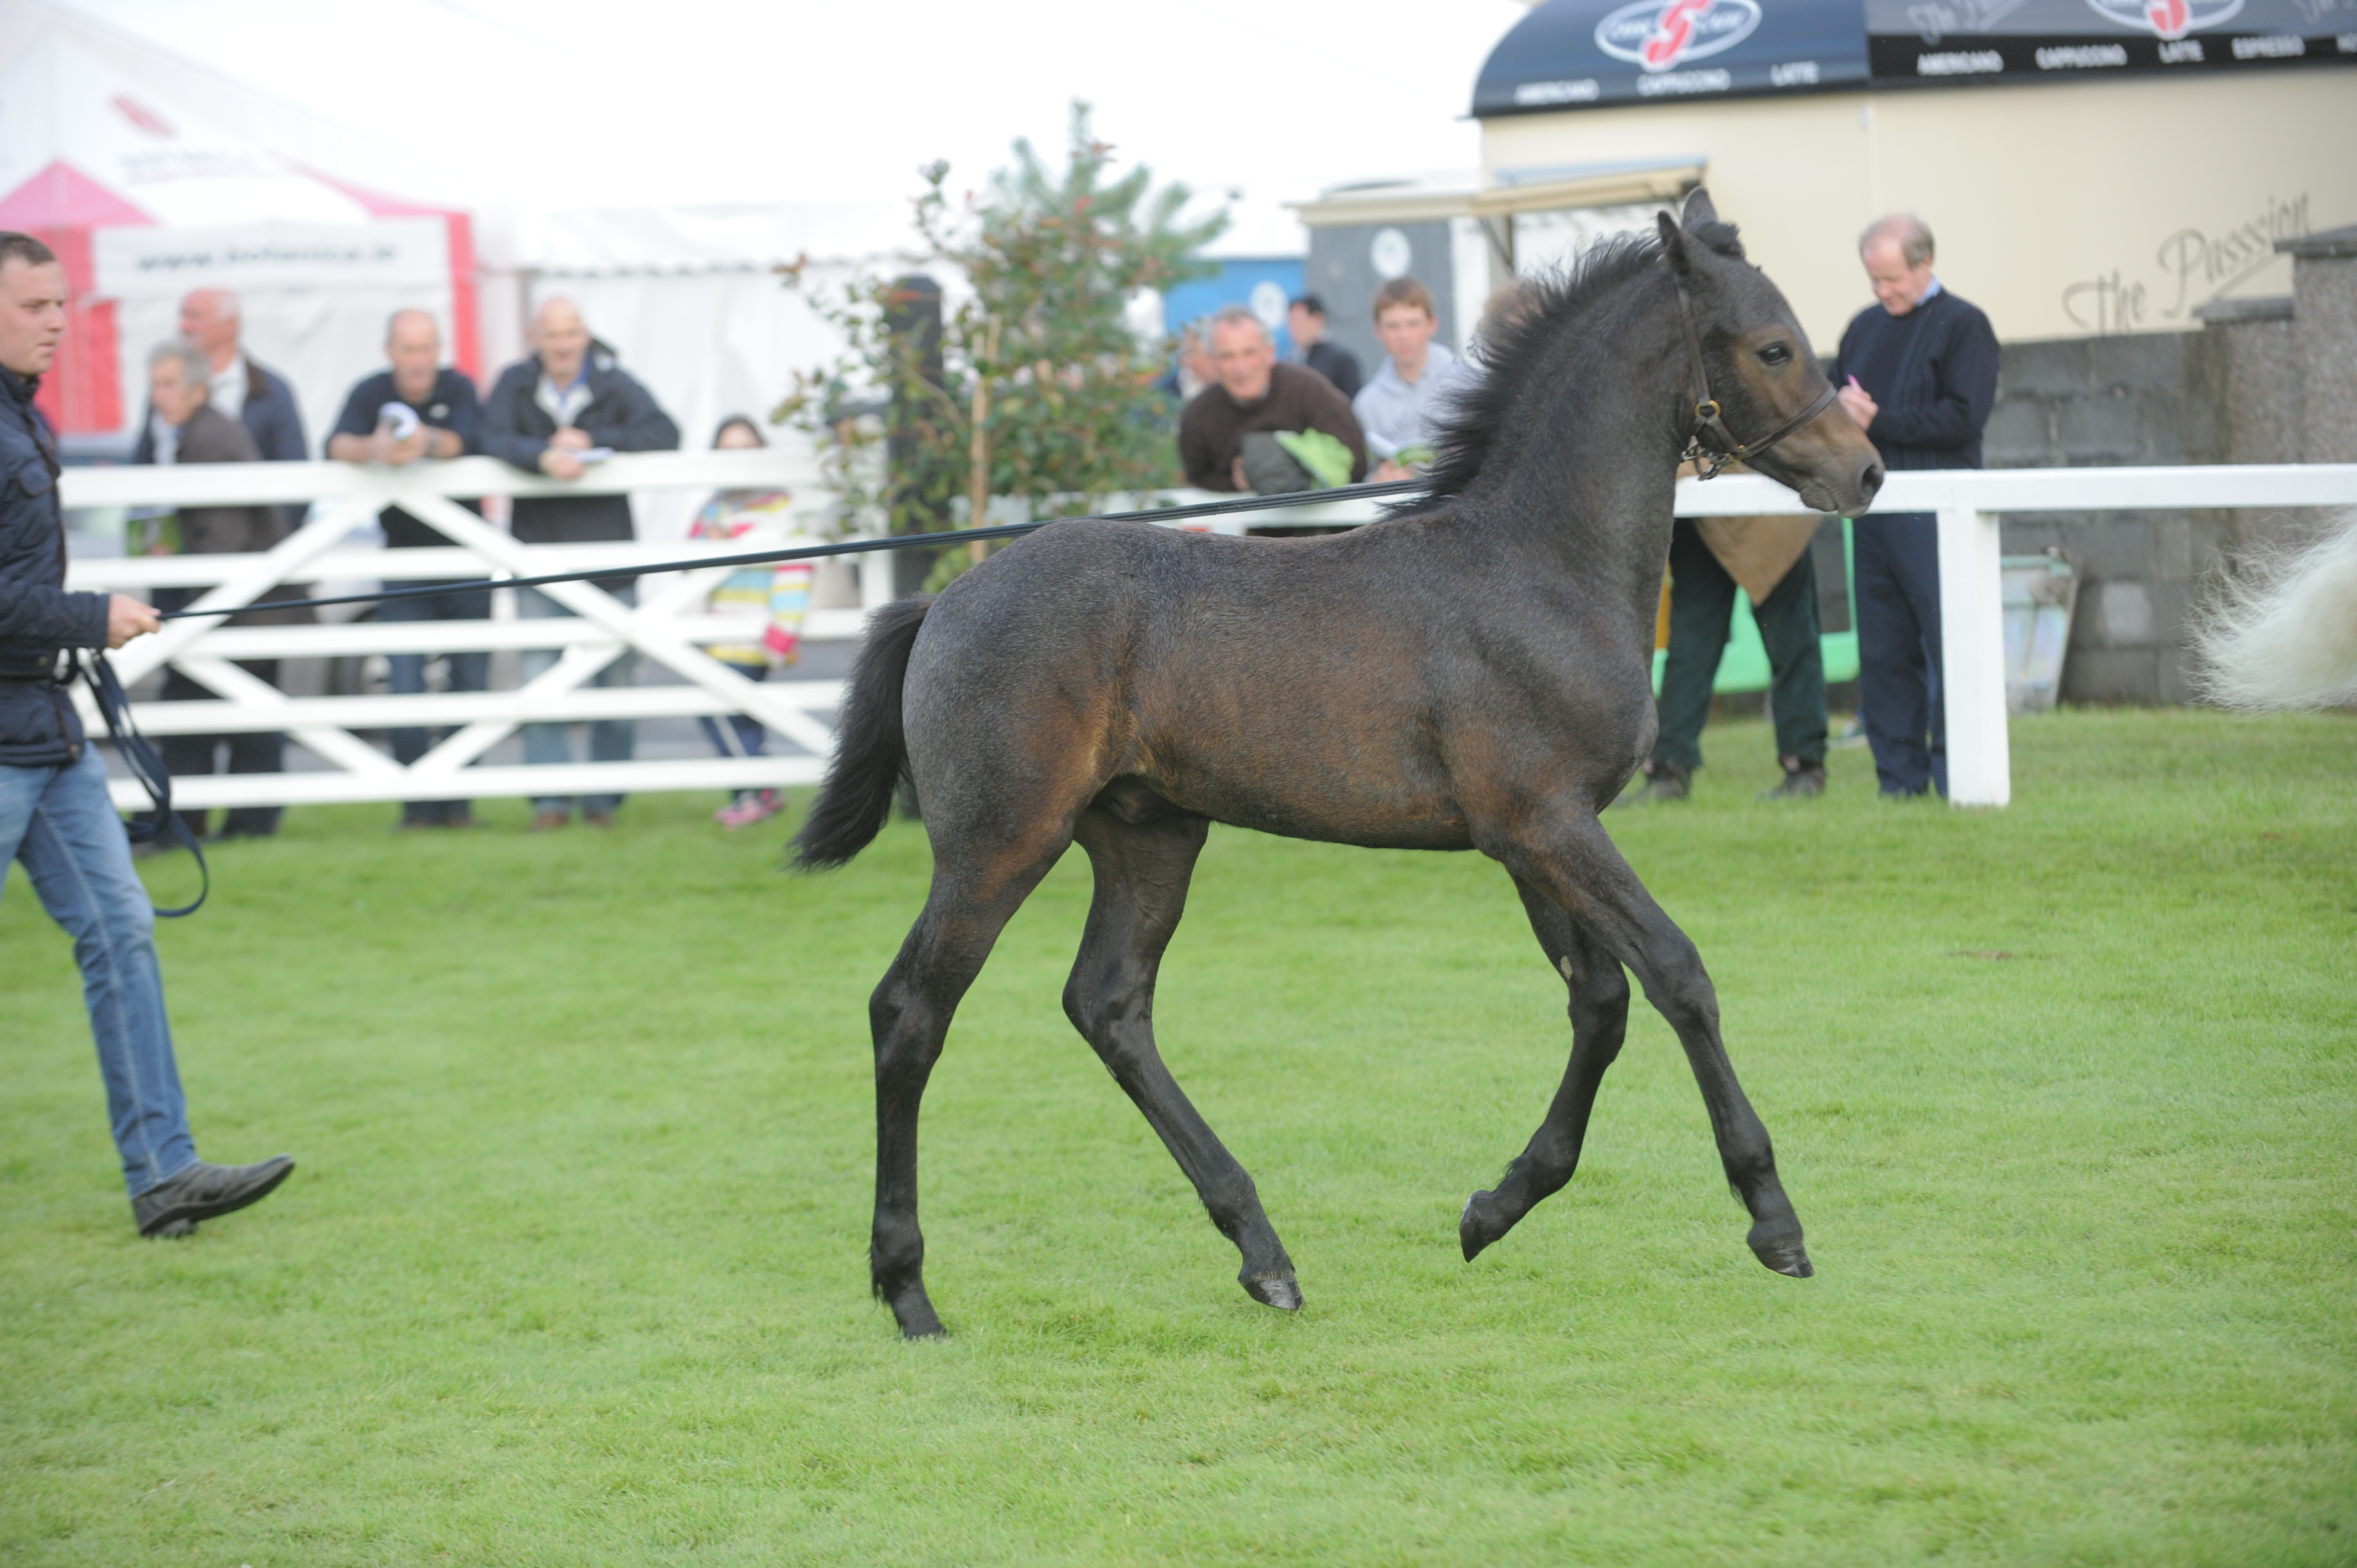 Equine Identification Regulations - Breeders please read